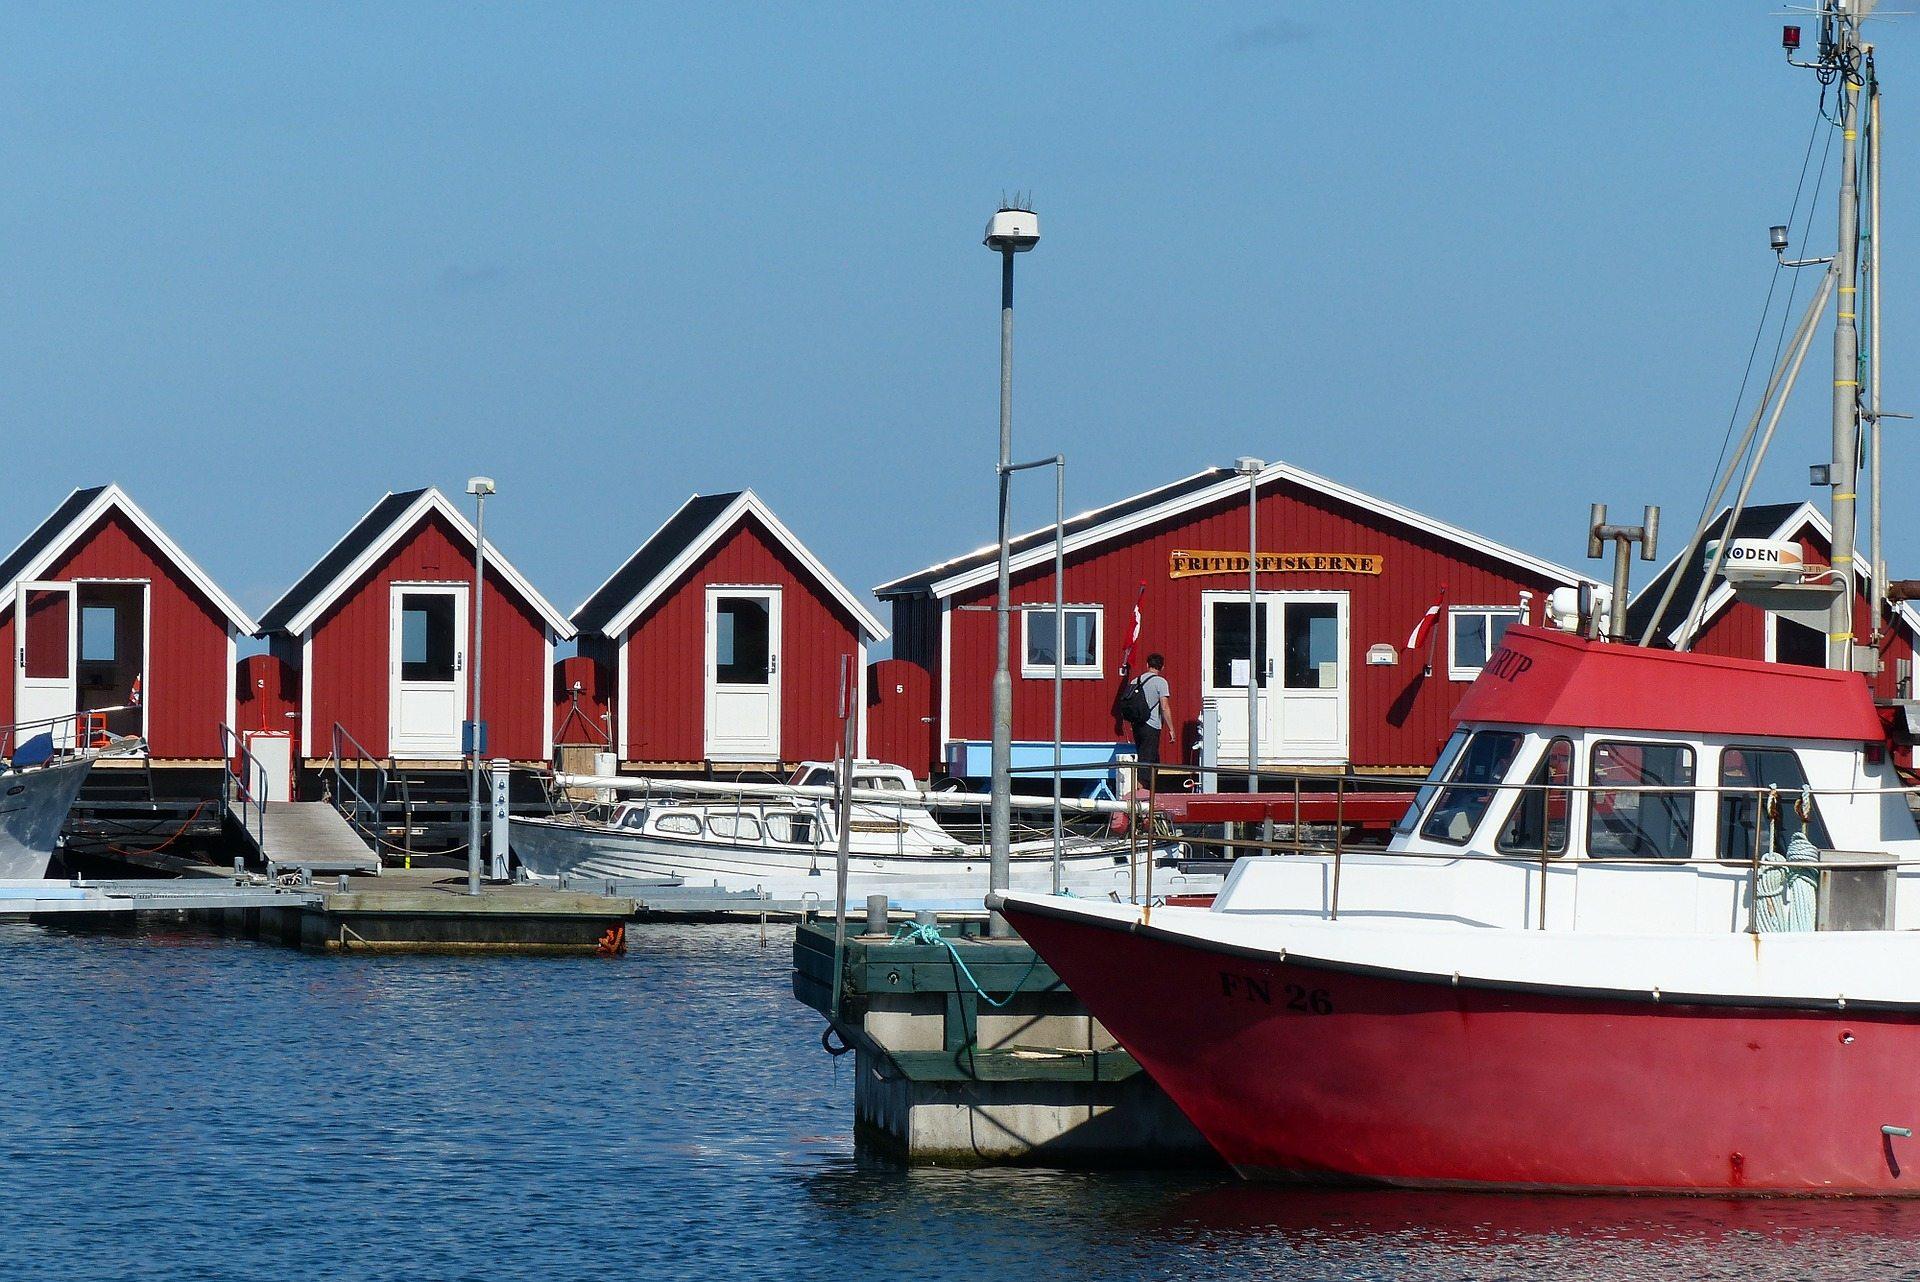 fishermens-cabins-240598_1920